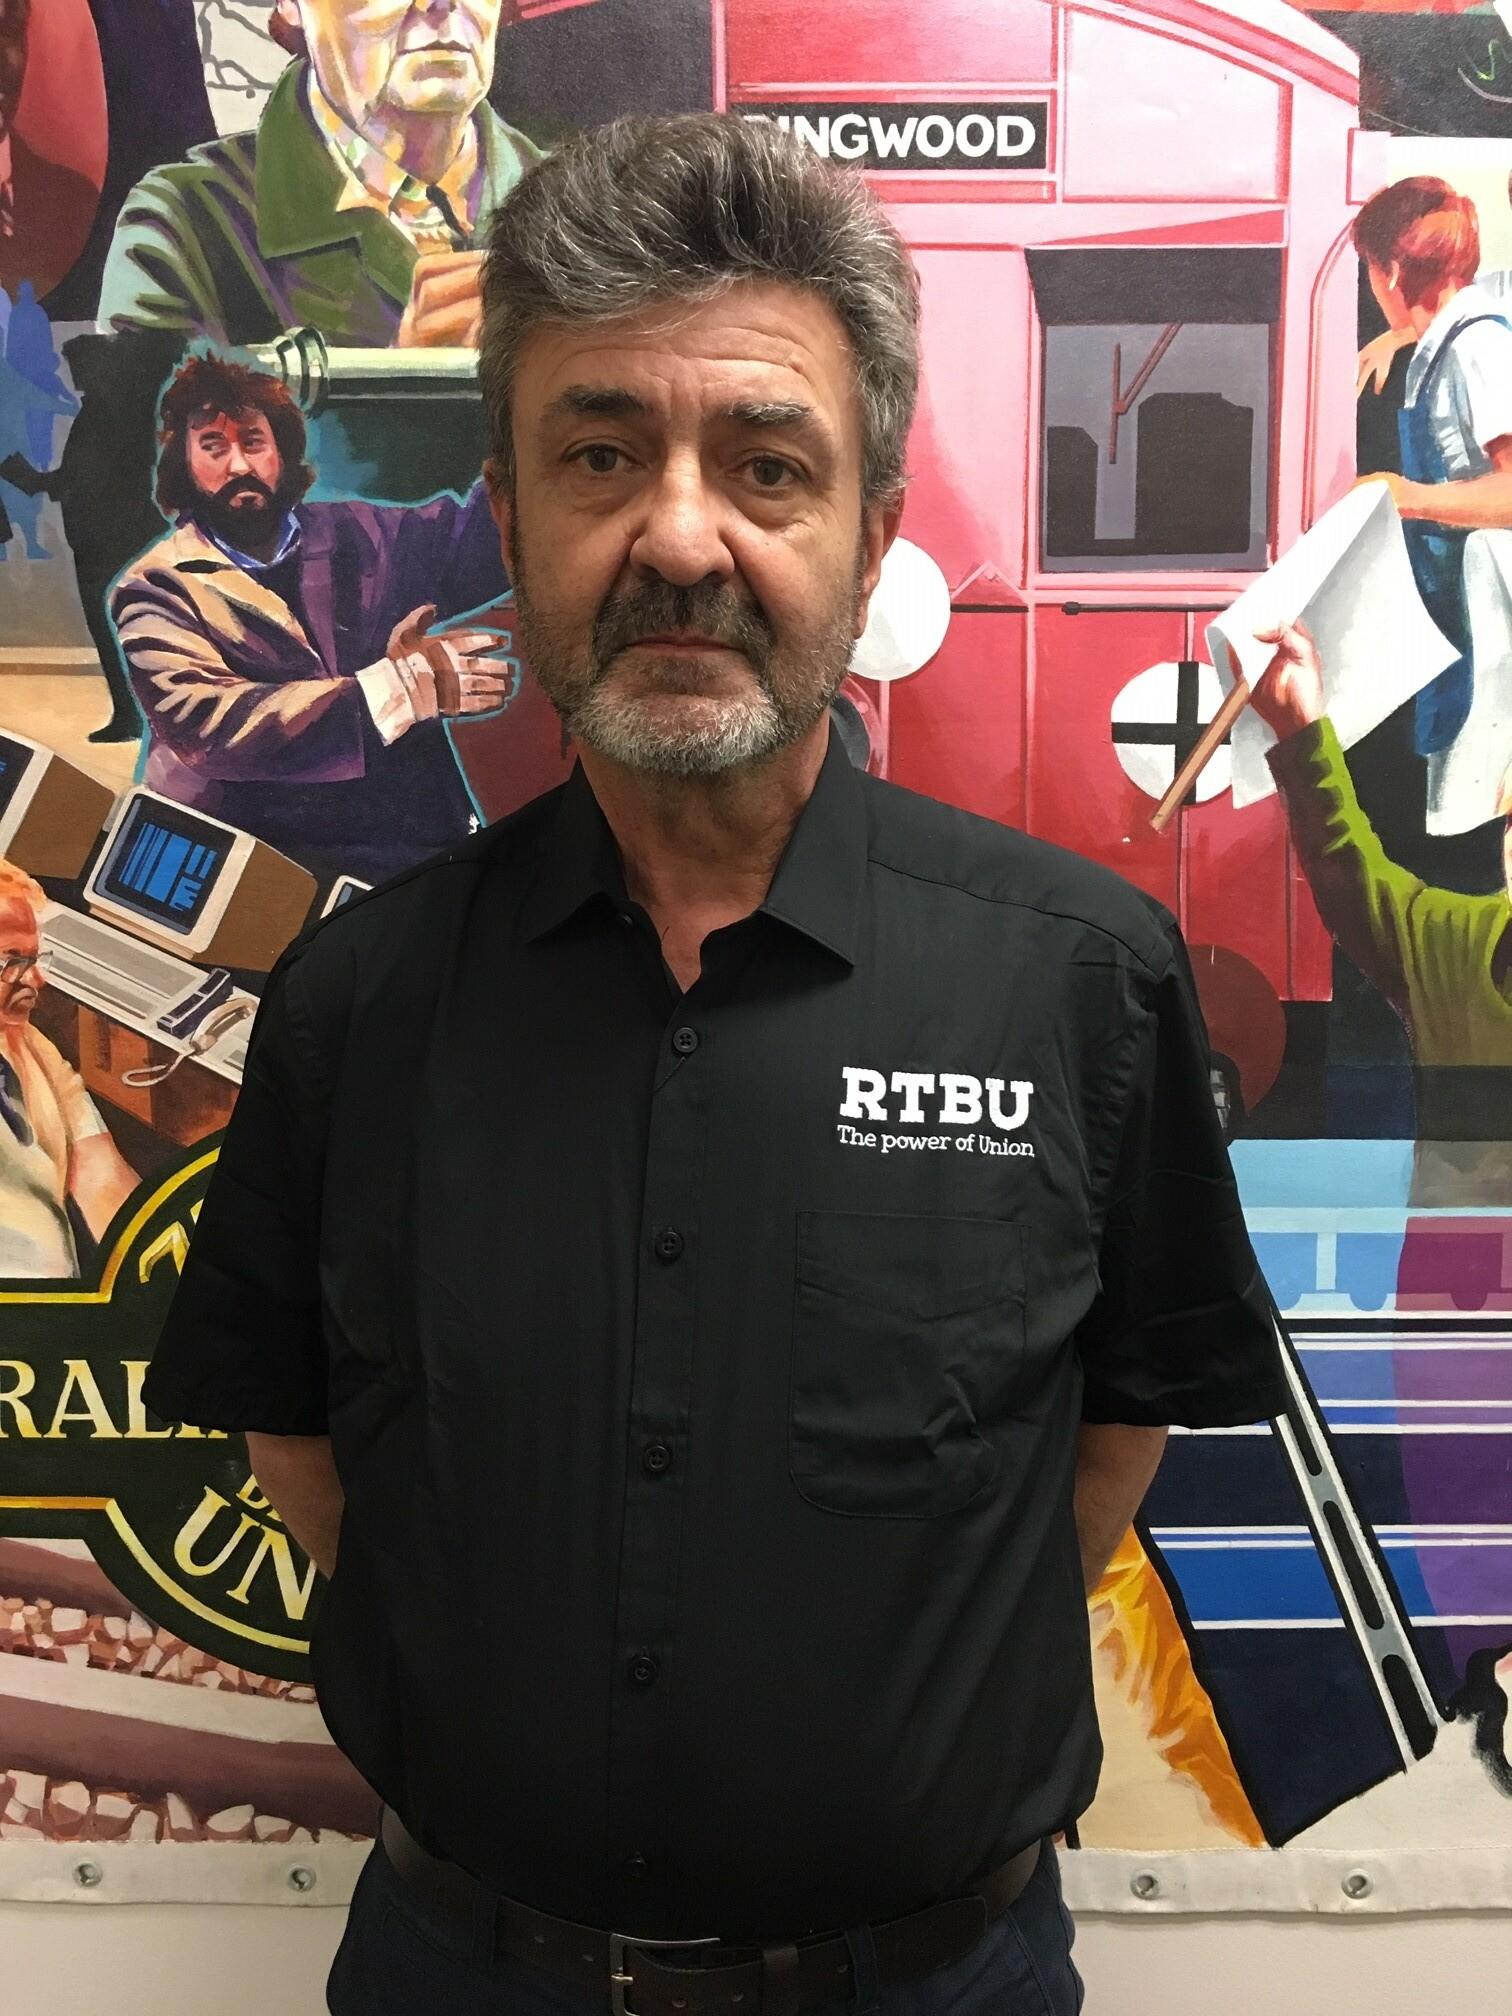 Men's Short Sleeve Business Shirt - Black 00028